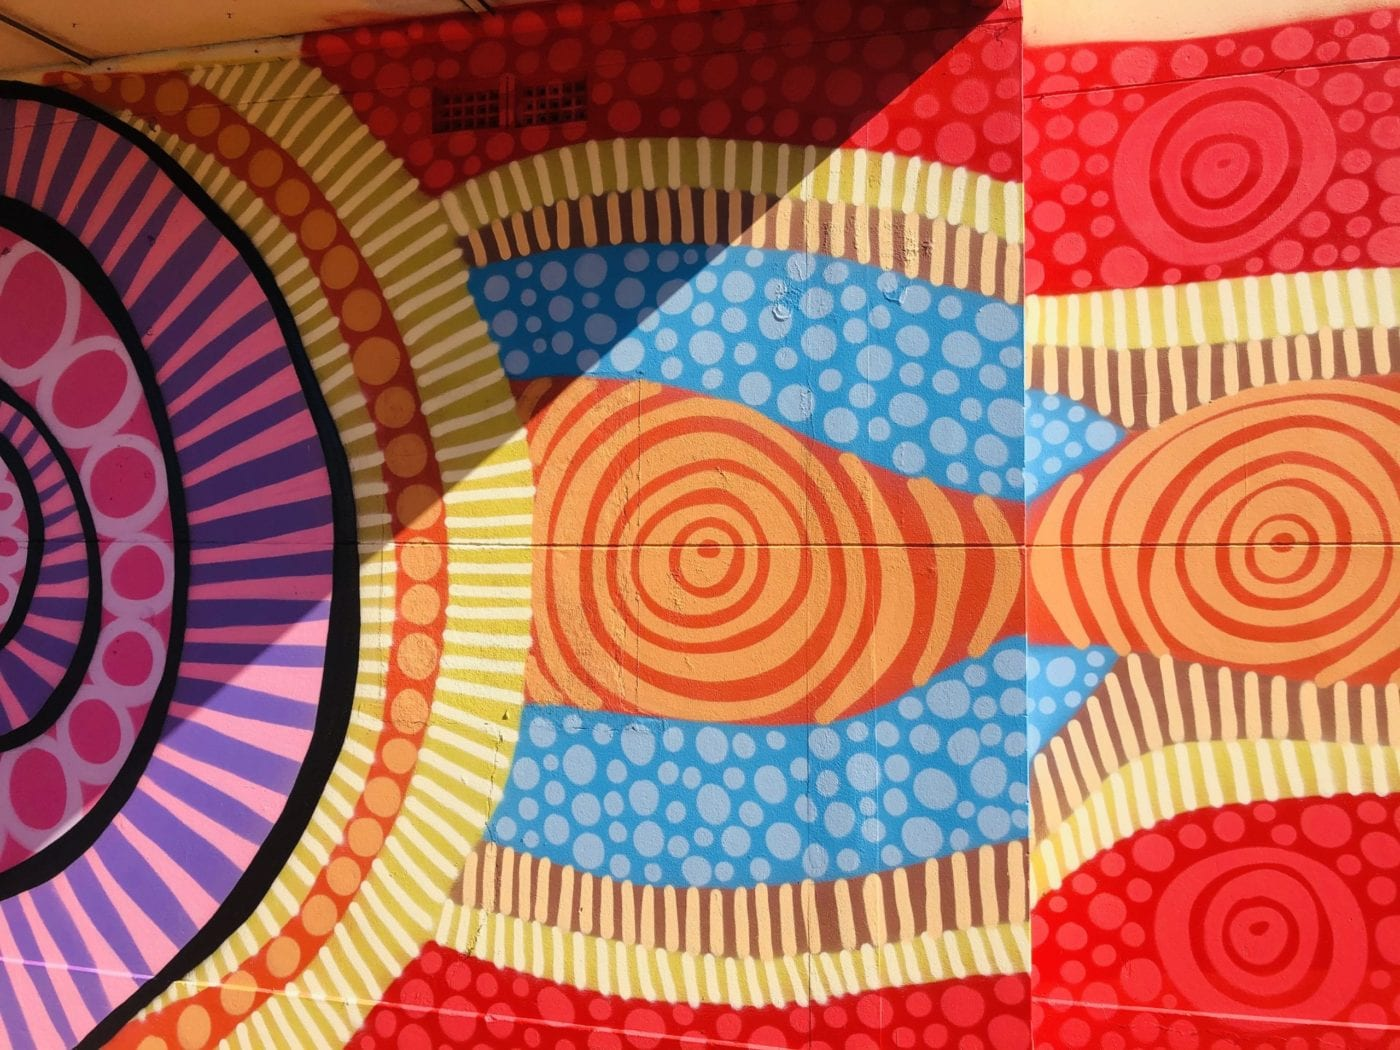 Scott Rathman artwork, Whyalla mural